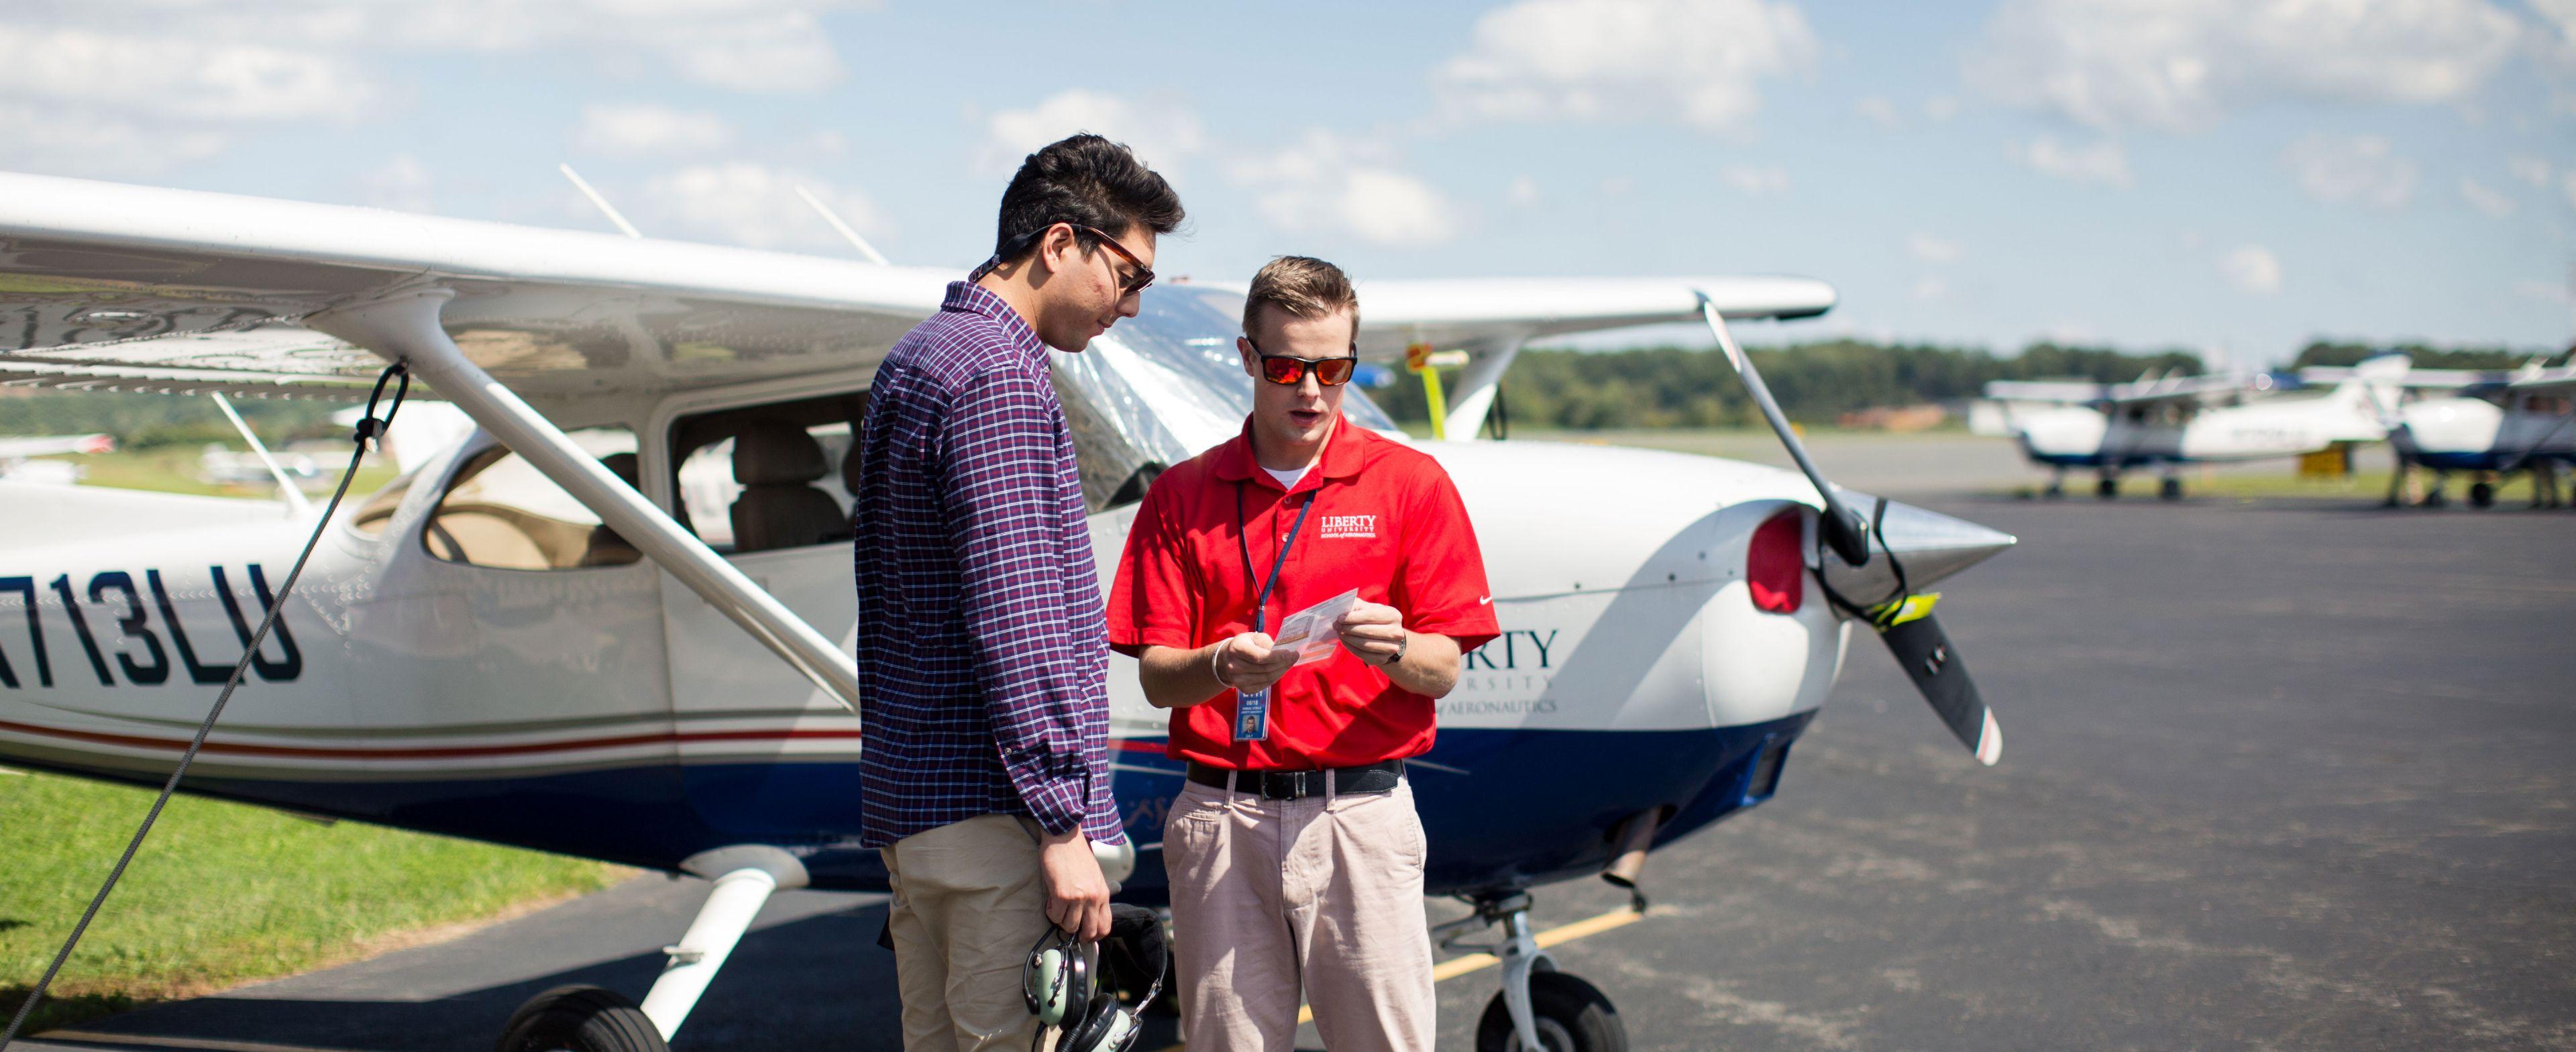 School Of Aeronautics Online Degree Program